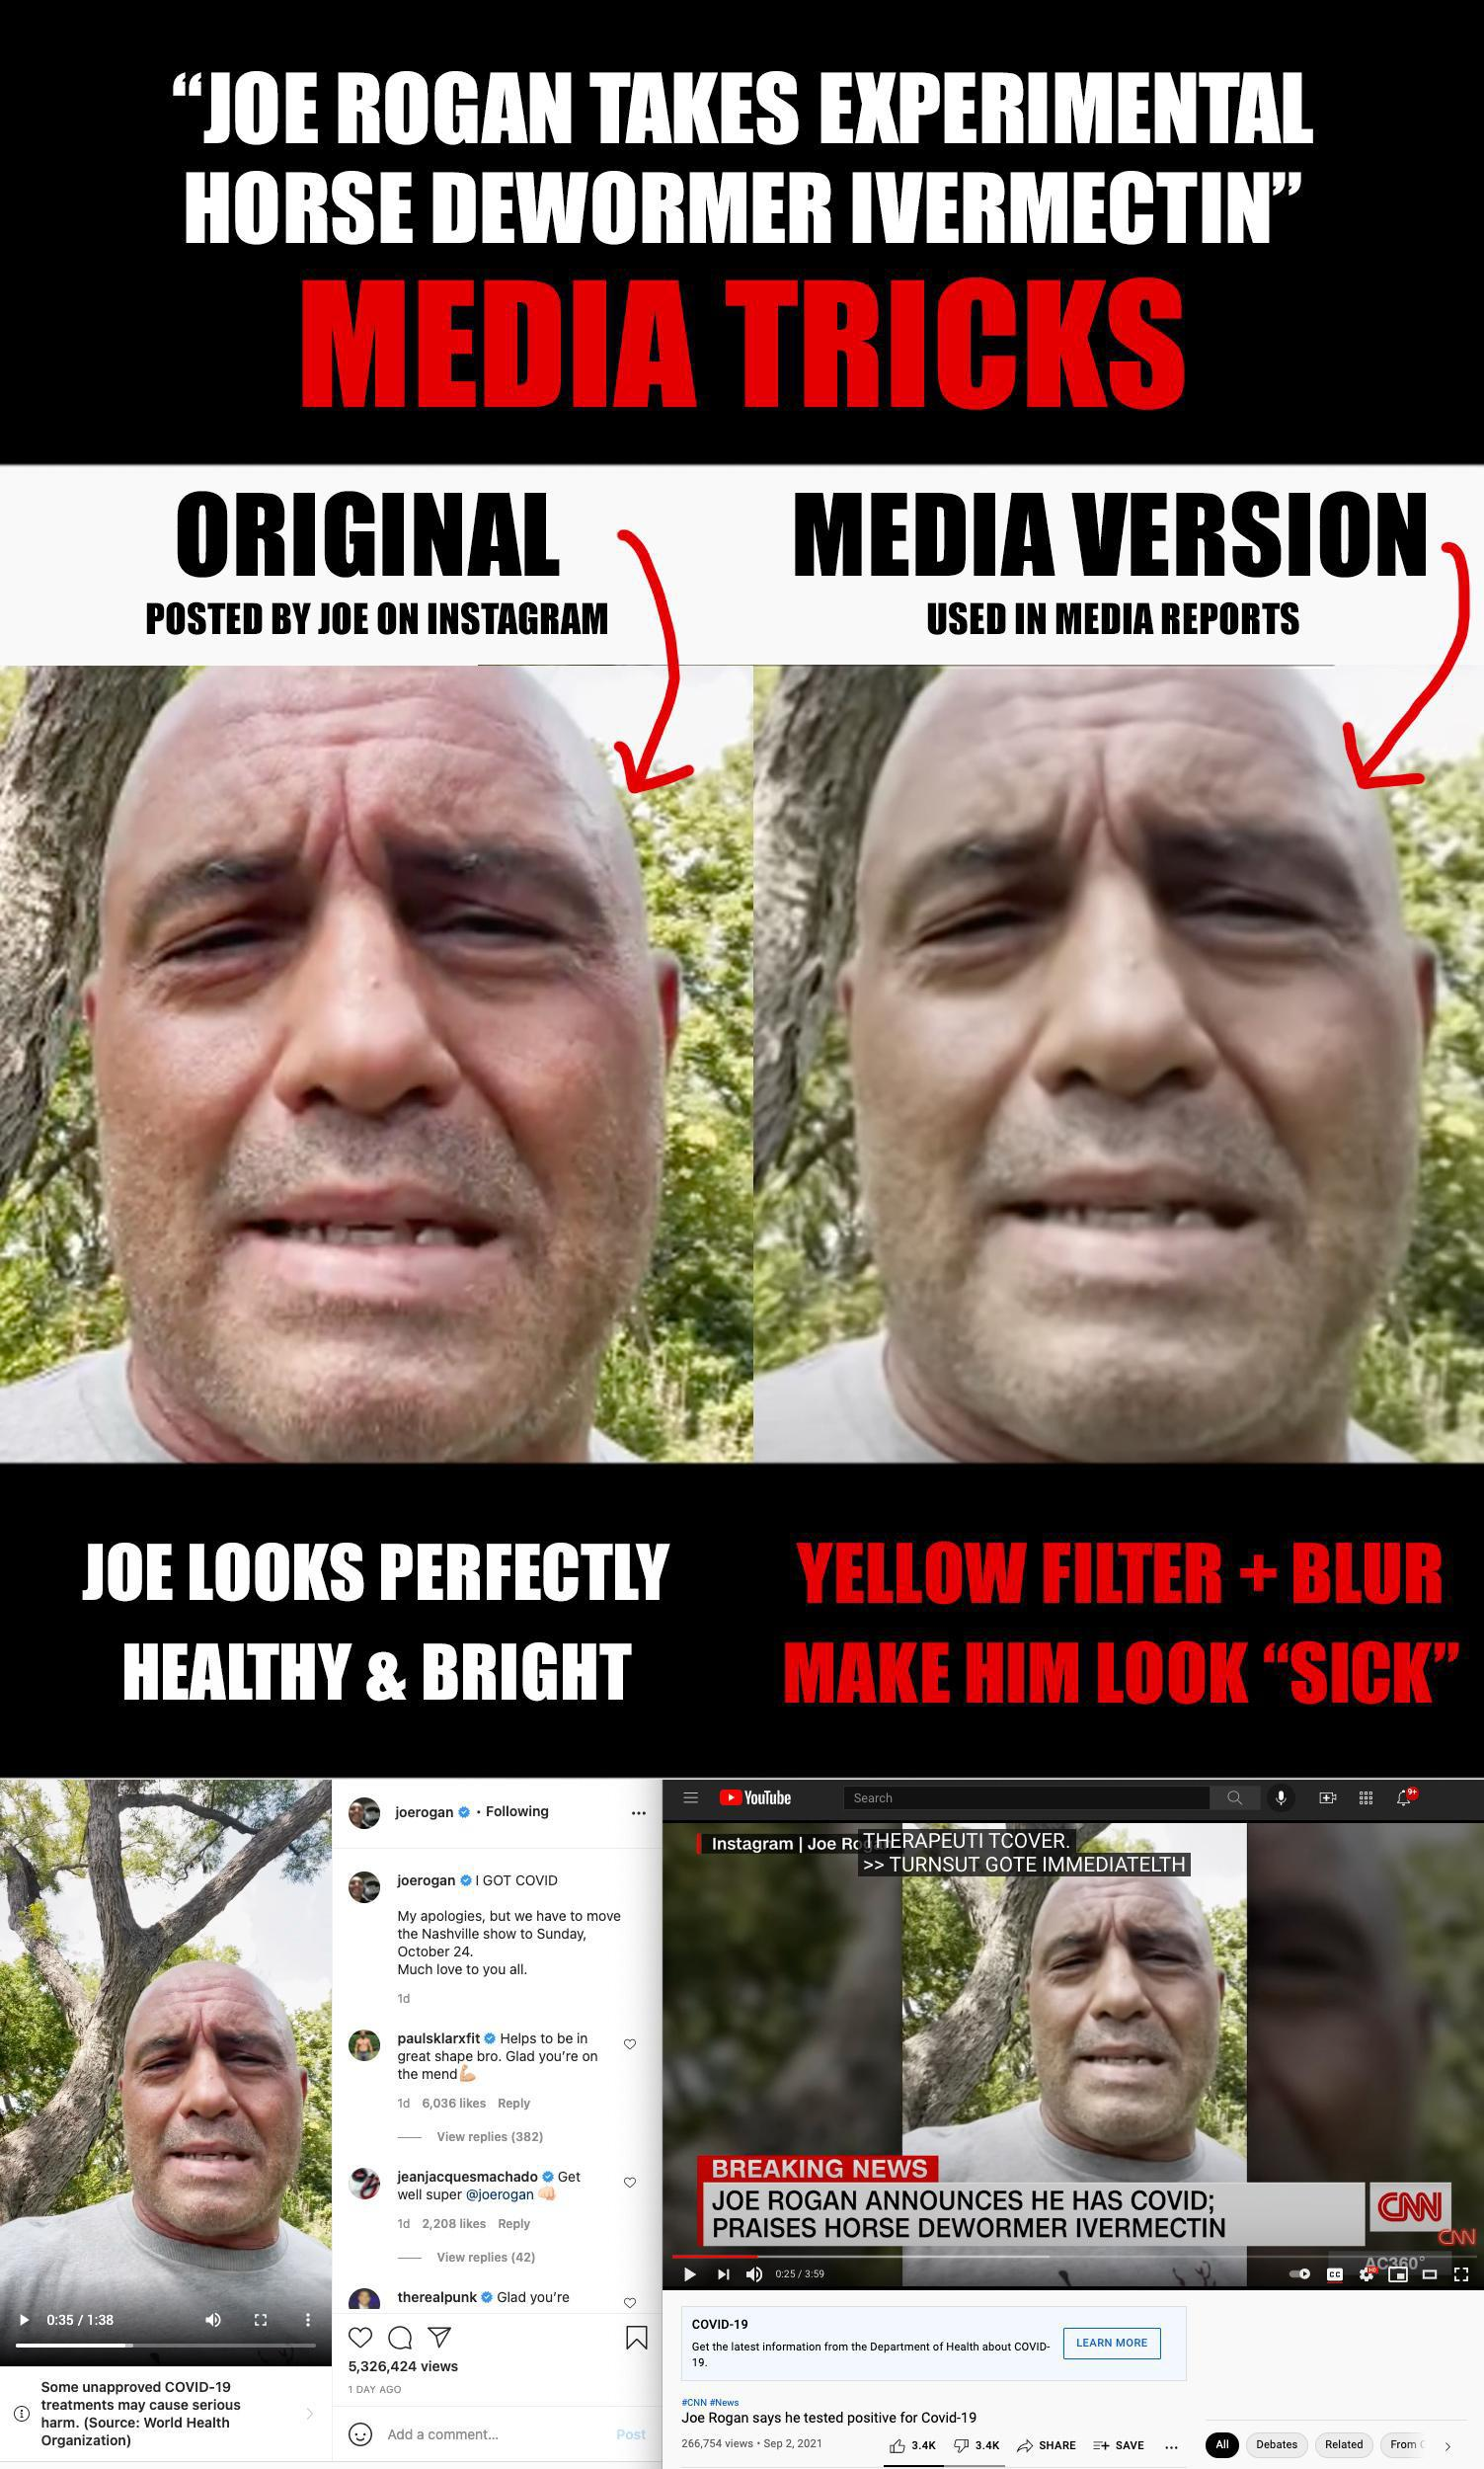 Joe Rogan Media Tricks Original